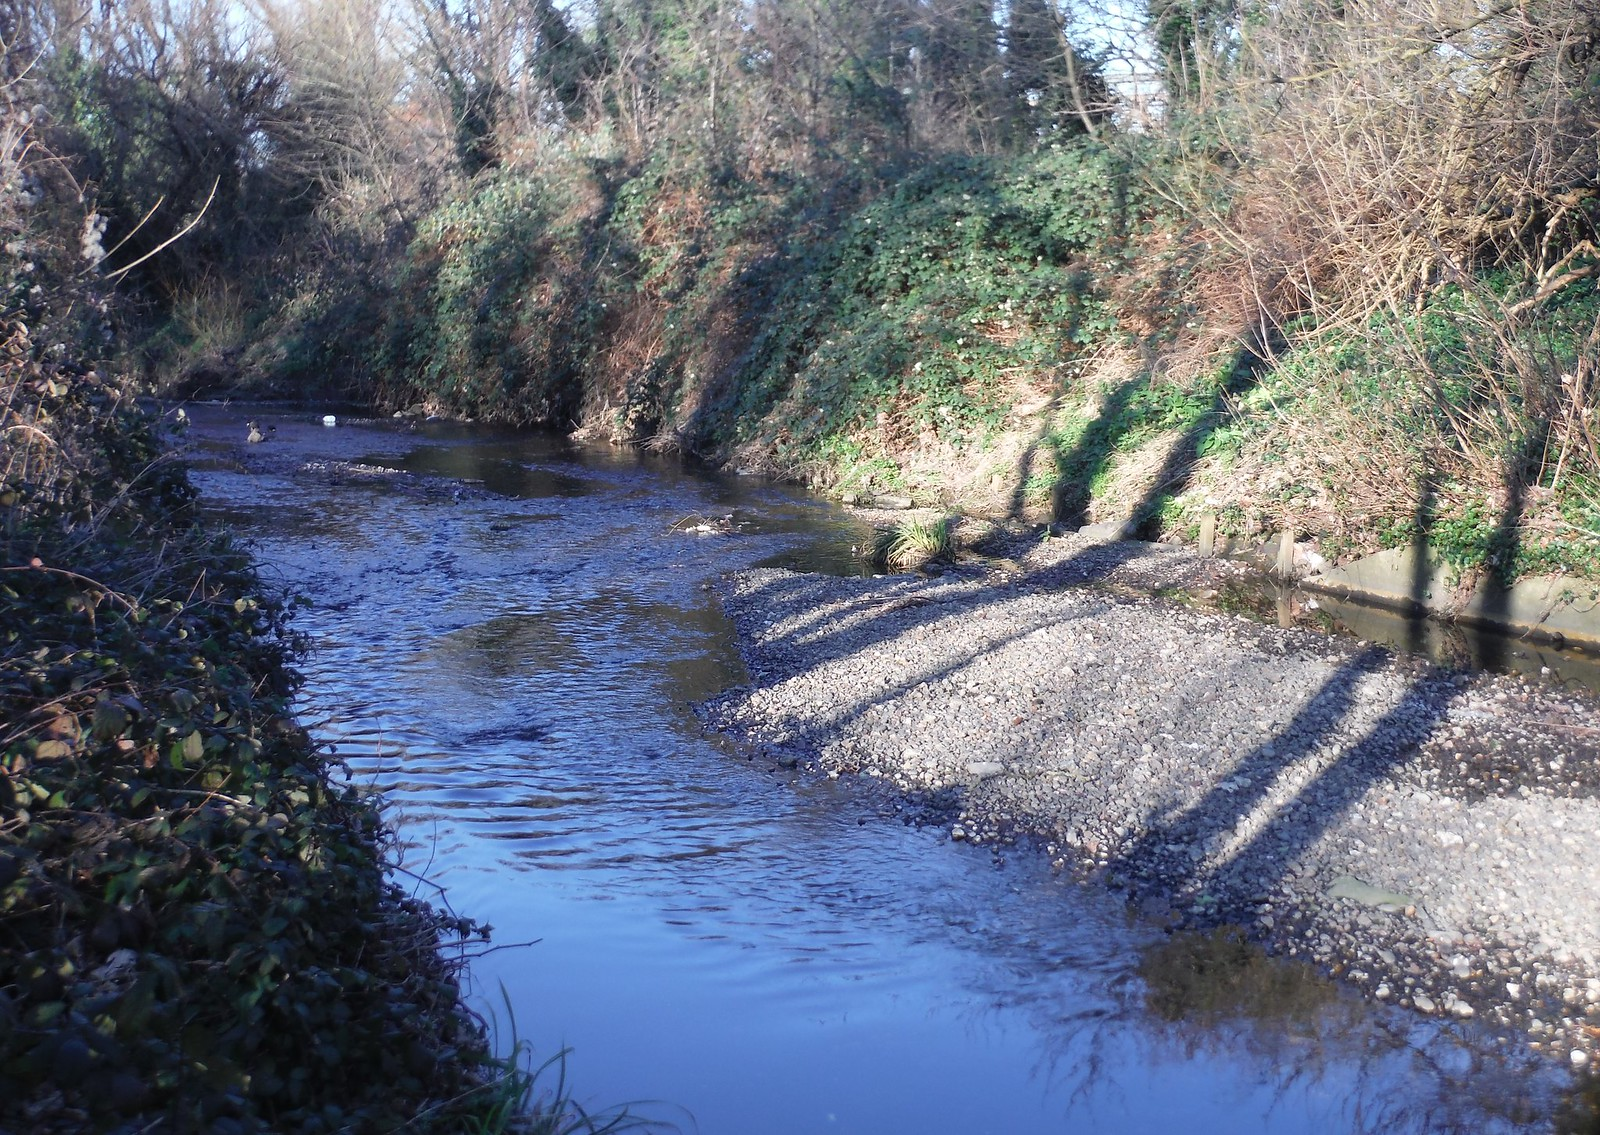 Gravel Bed in River Ravensbourne SWC Short Walk 36 - Waterlink Way (Lower Sydenham to Greenwich)